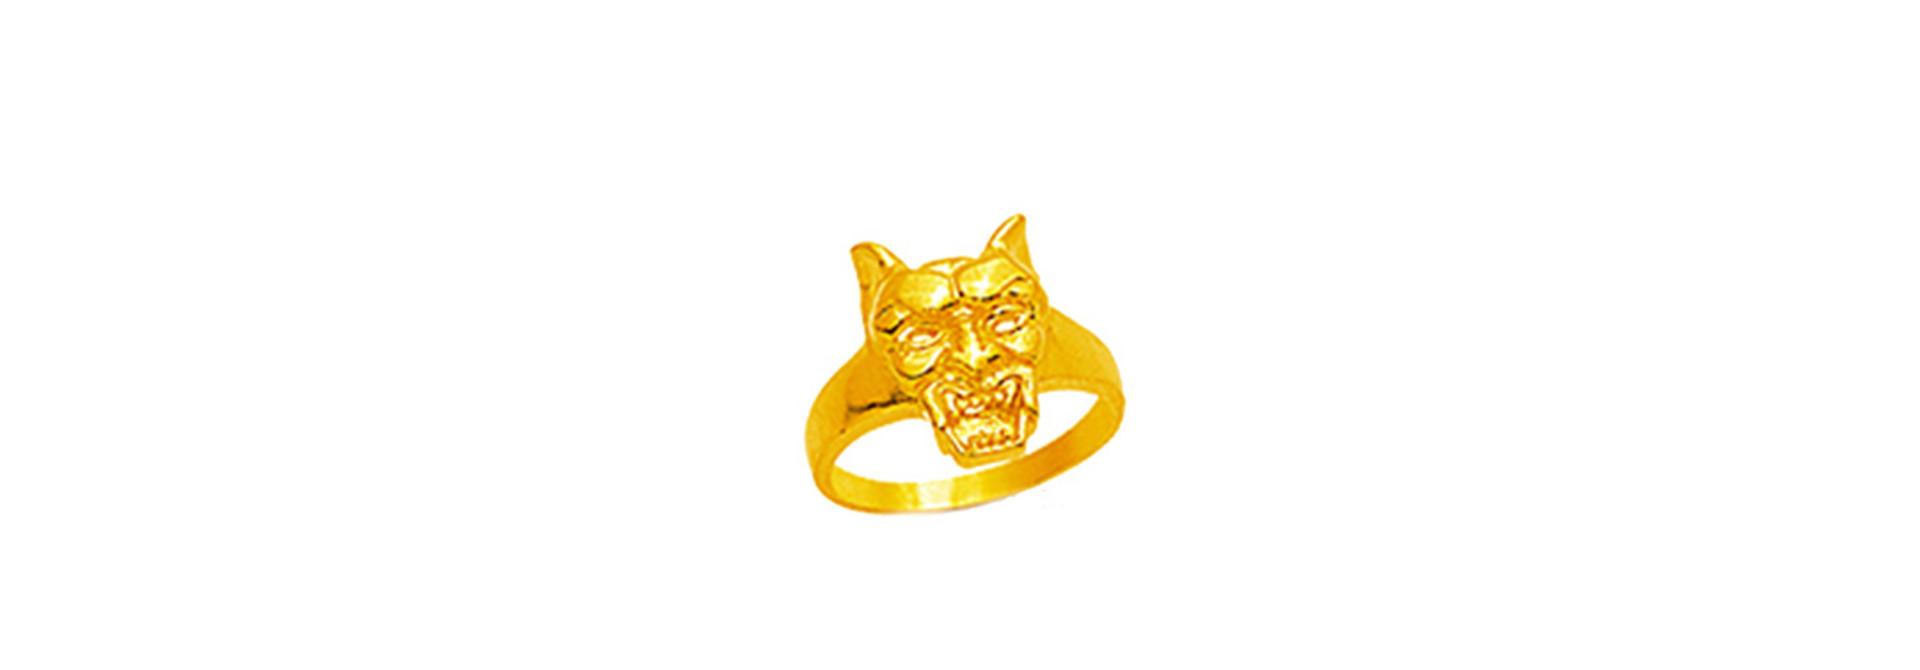 Hell hound ring